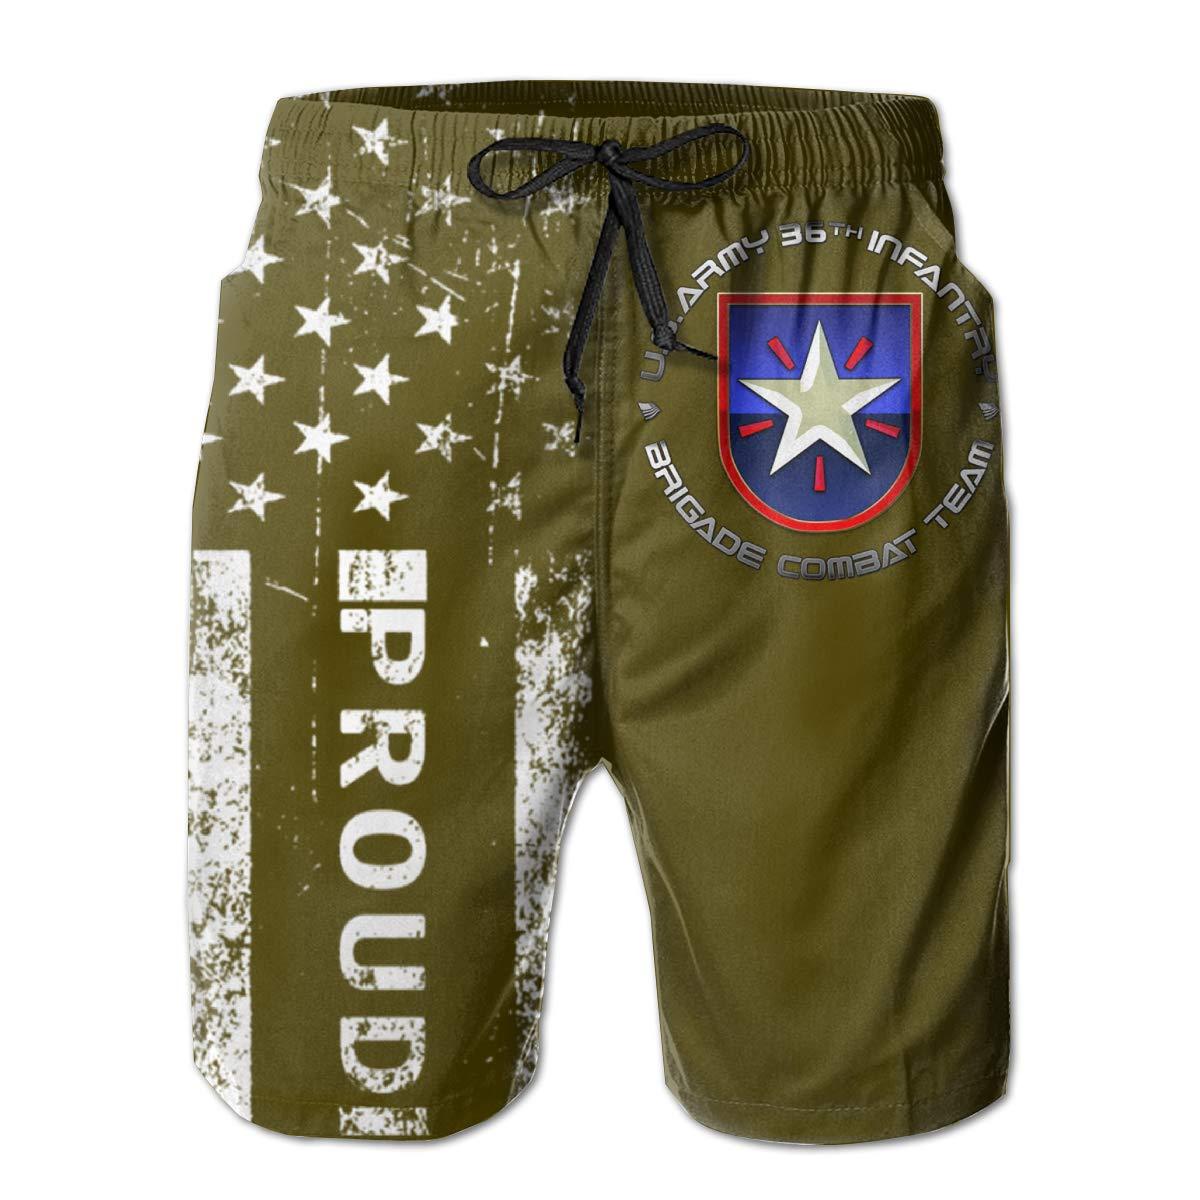 36th Infantry Brigade SSI Mens Boardshorts Swim Trunks Beach Athletic Shorts